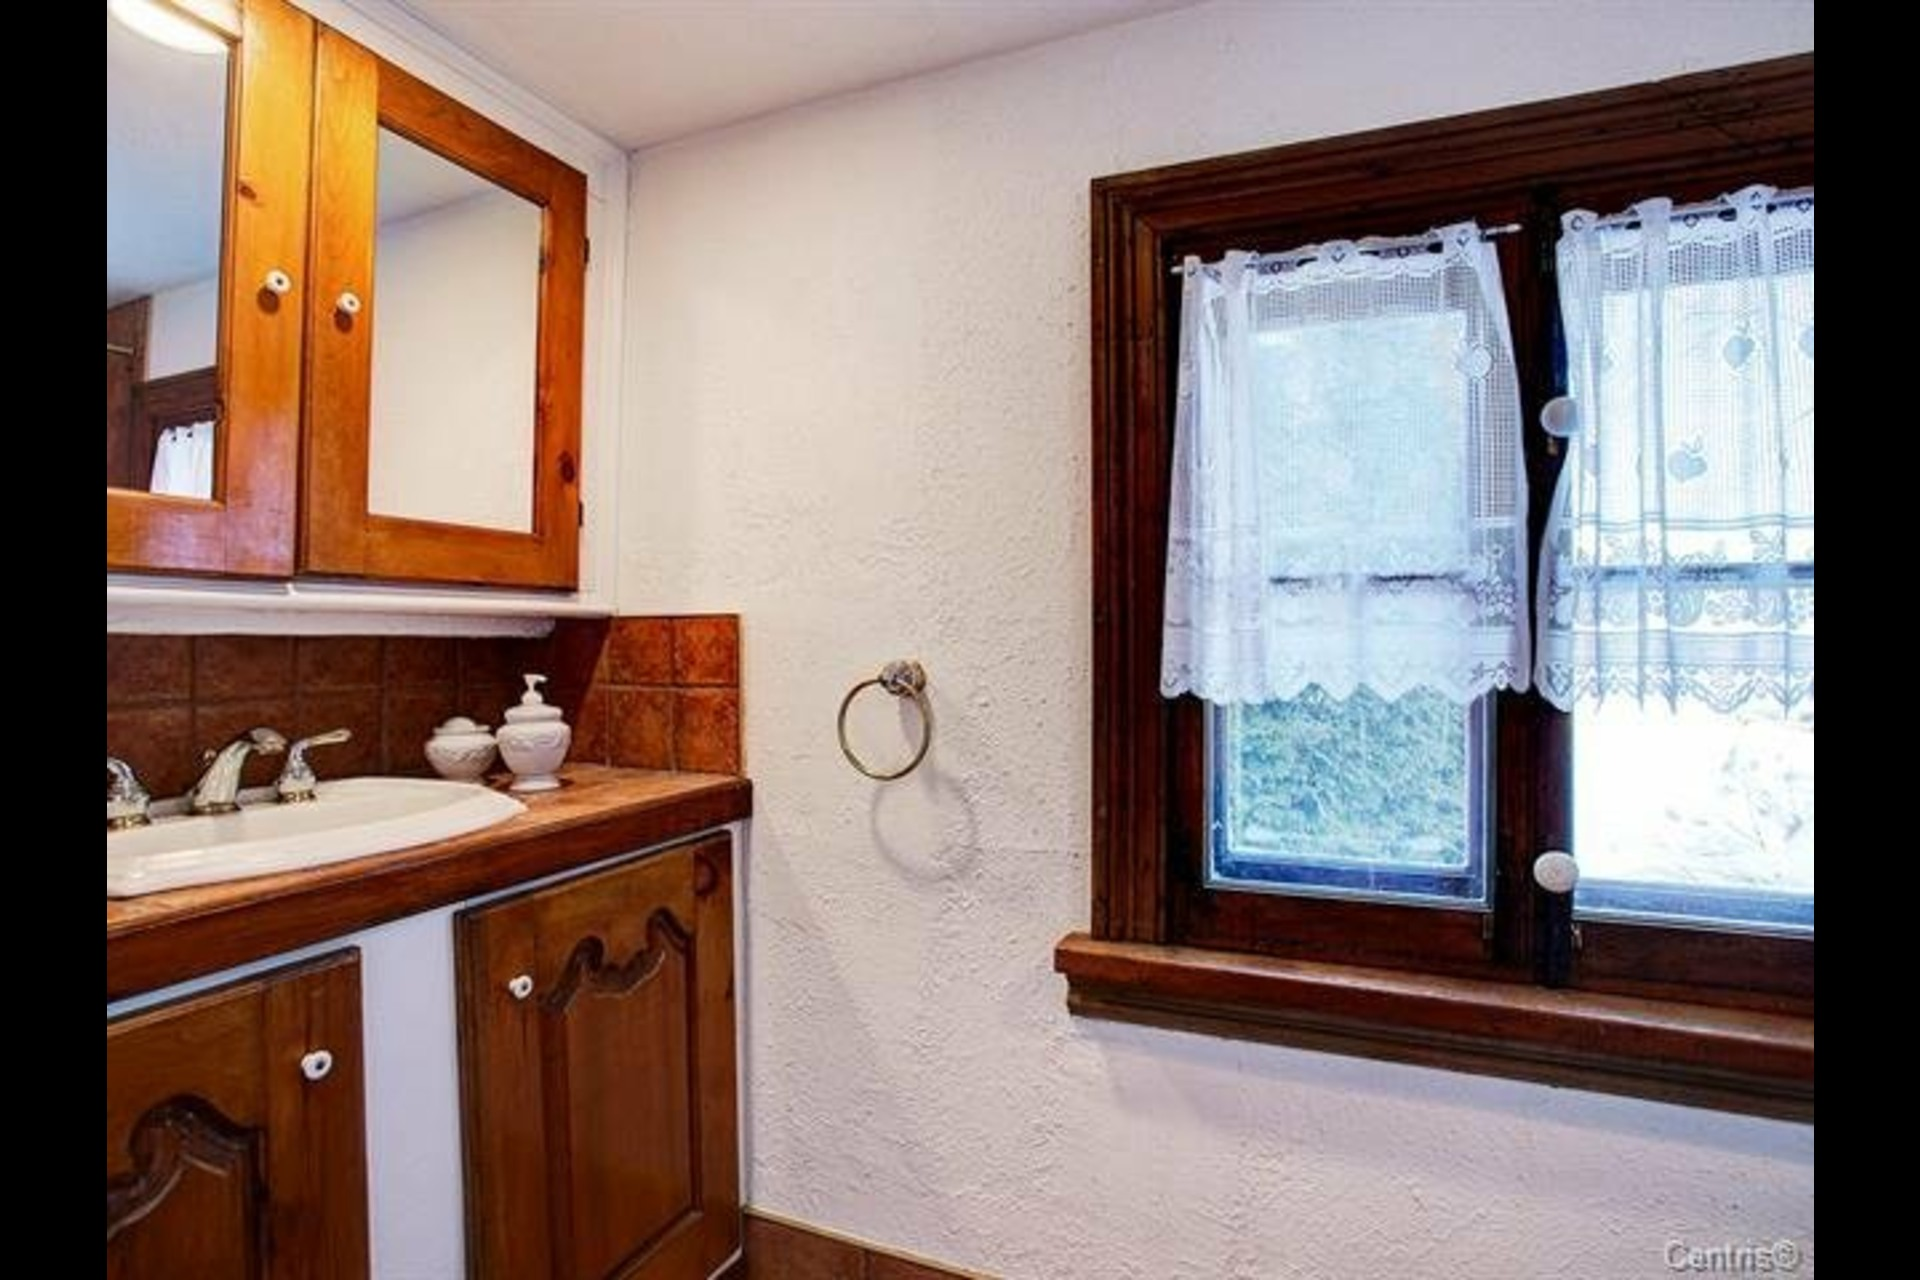 image 9 - MX - Casa sola - MX Para alquiler Vaudreuil-Dorion - 12 habitaciones